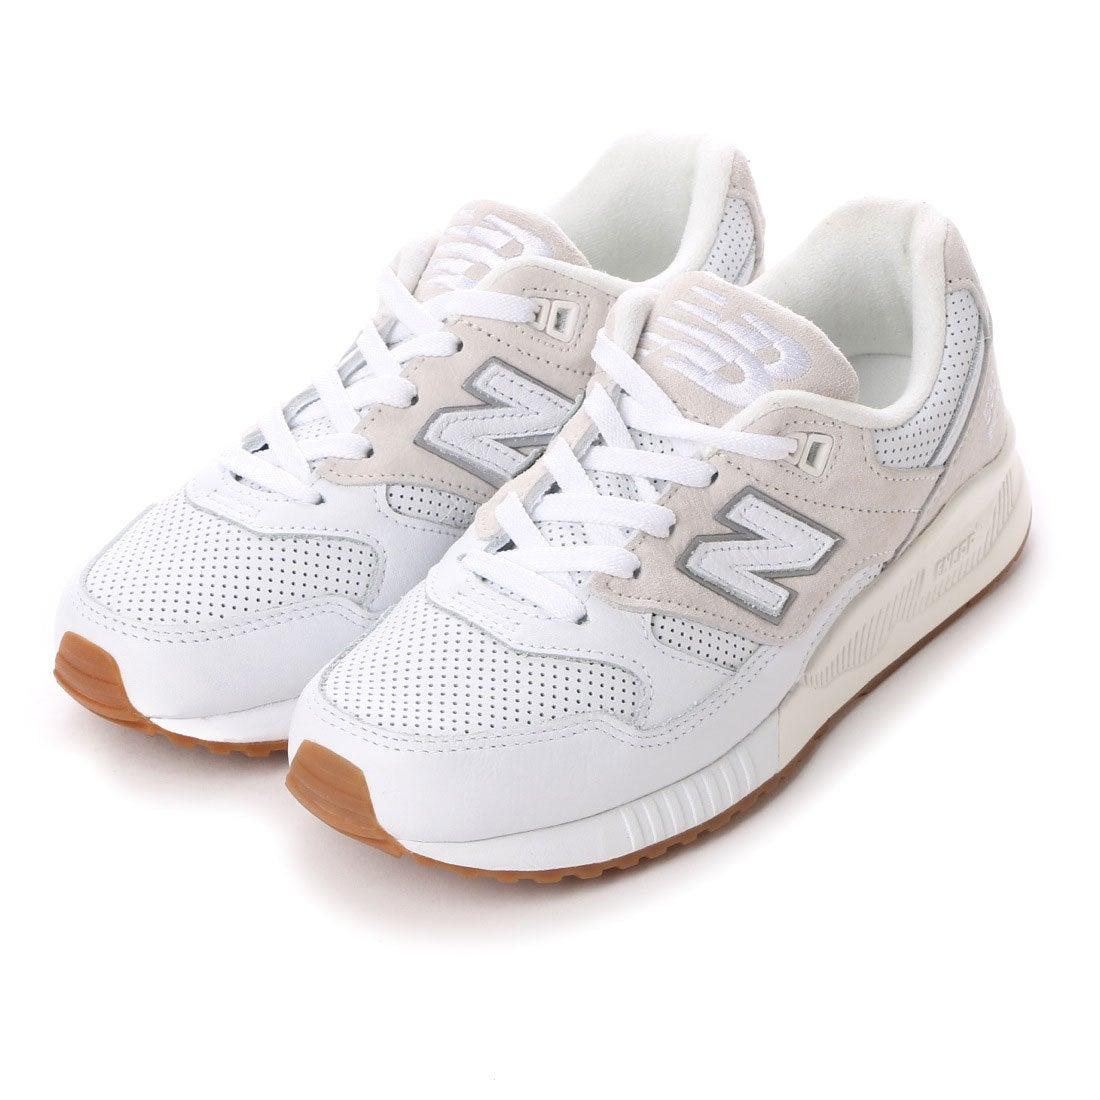 meilleur site web bb72f 5ef76 ニューバランス new balance atmos M530 (ATA)-靴 ...